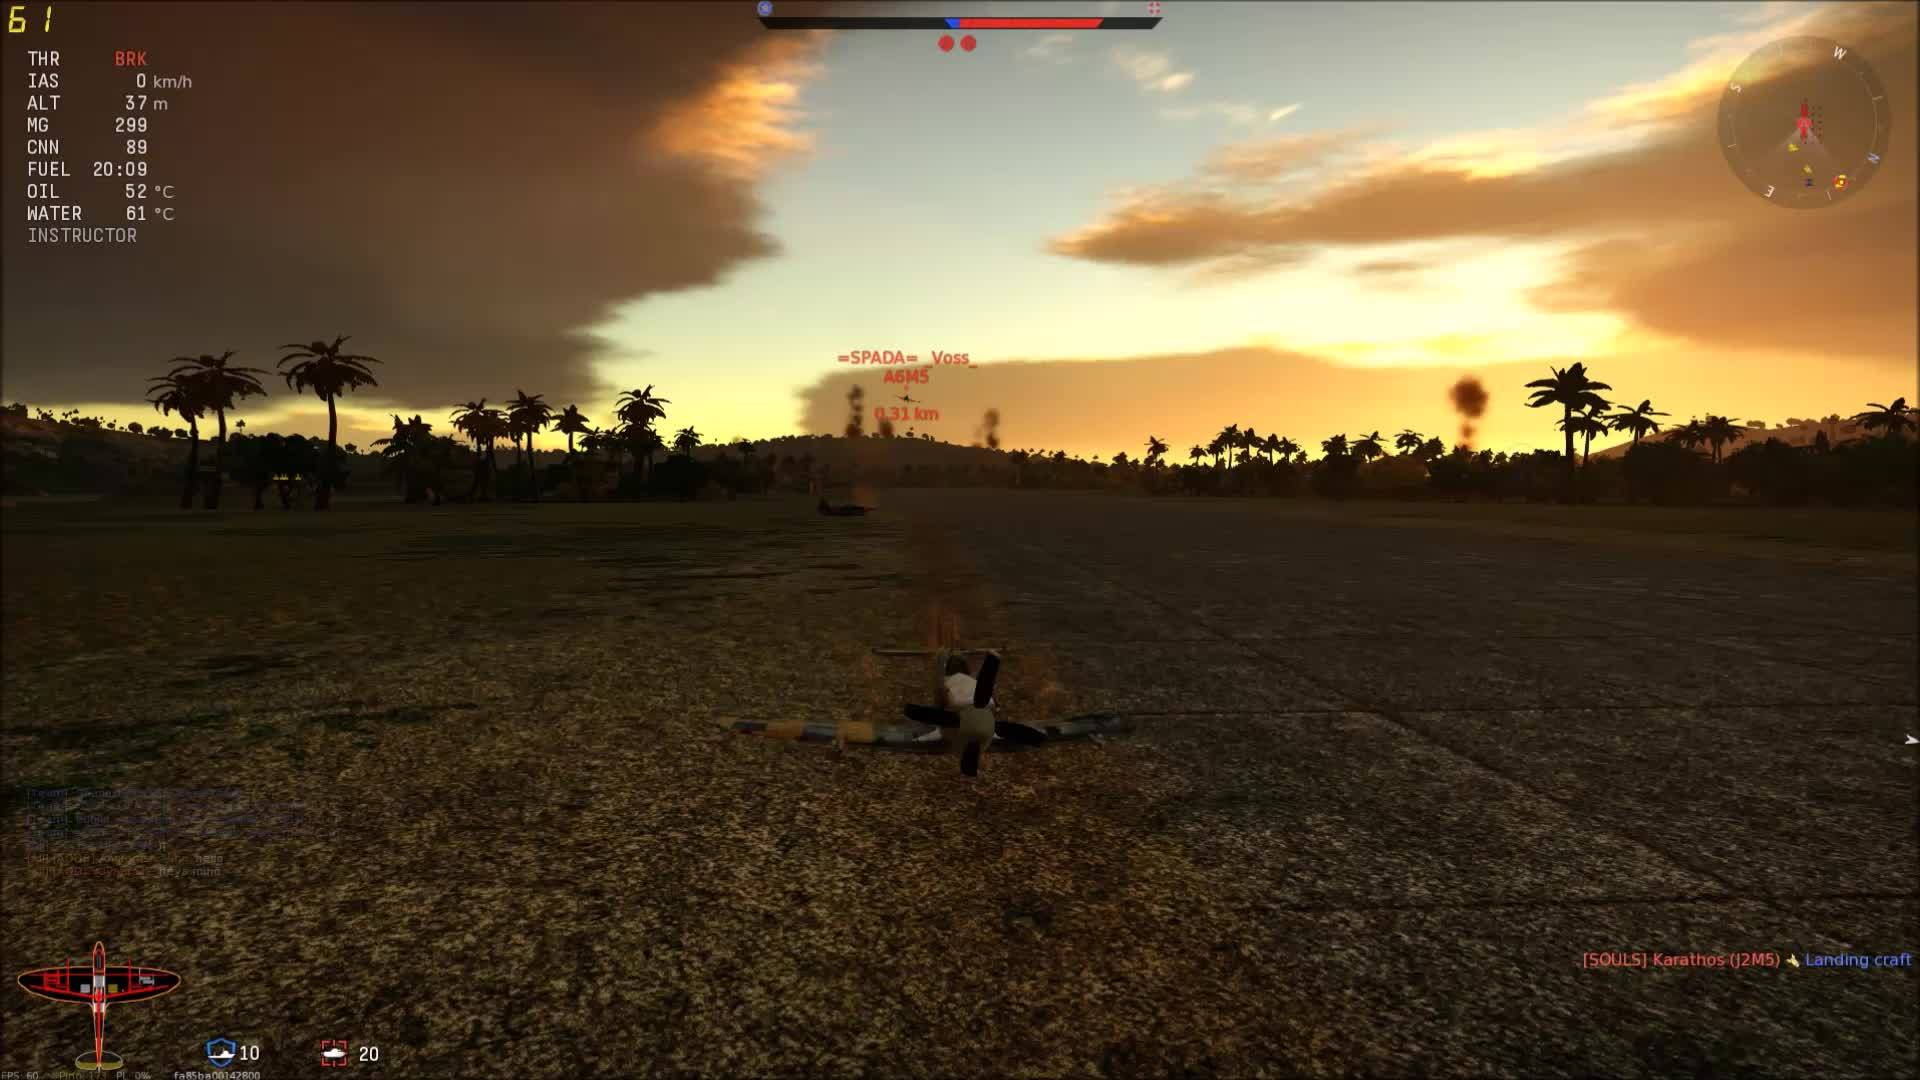 war thunder, warthunder, Aftermath and Frustration GIFs